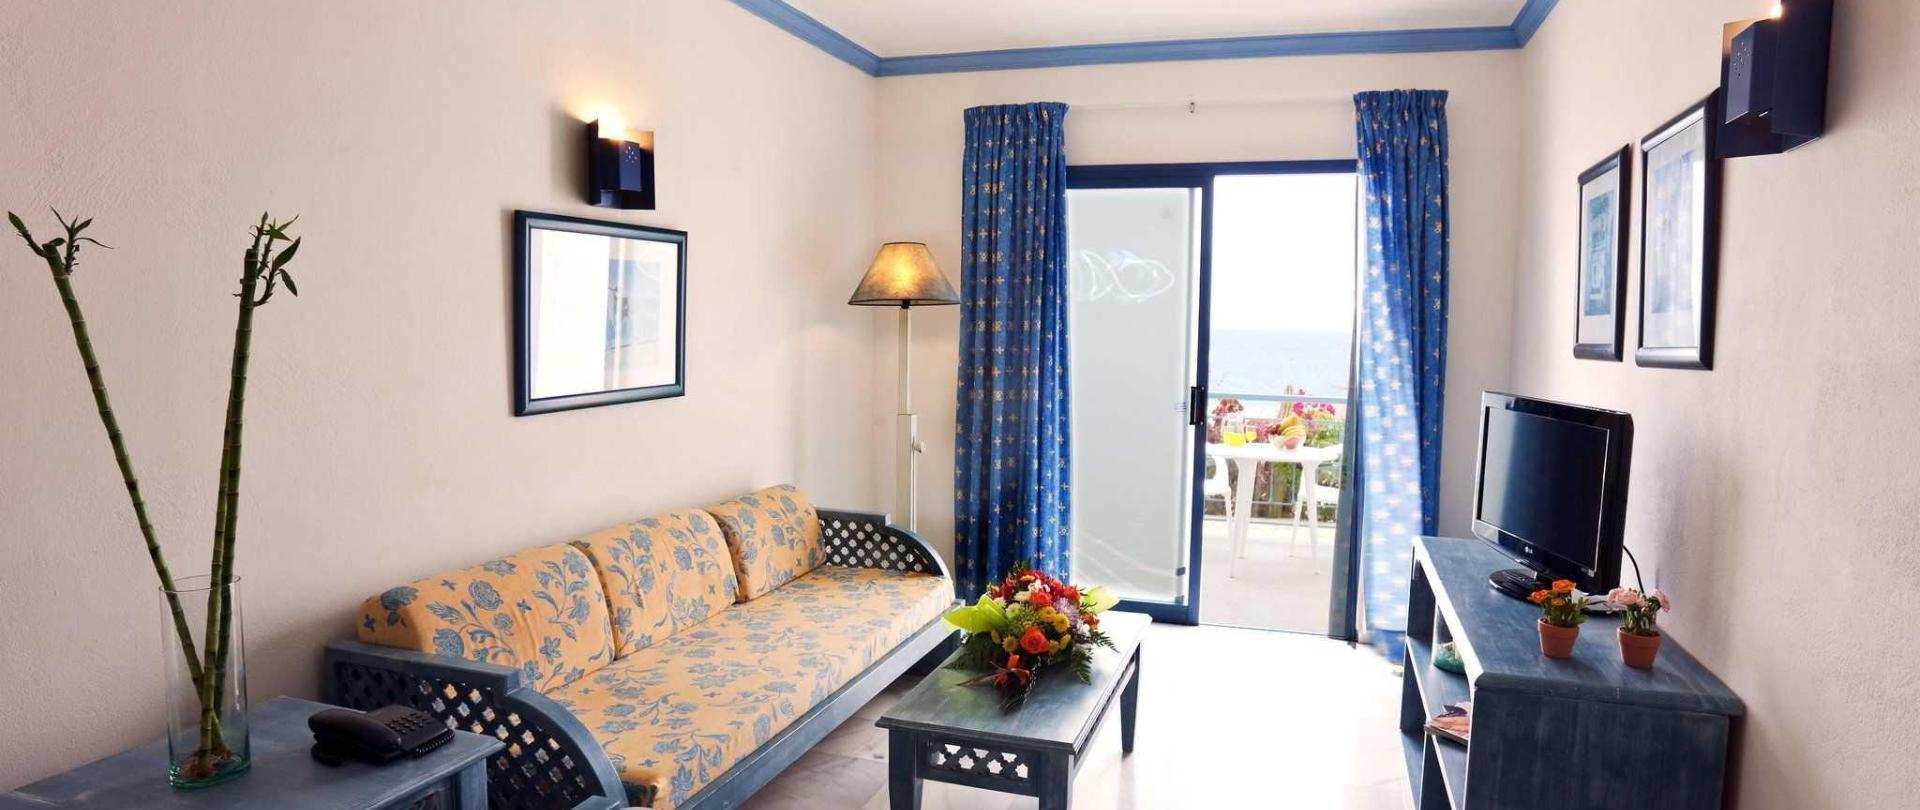 apartamento-n-1-5.jpg